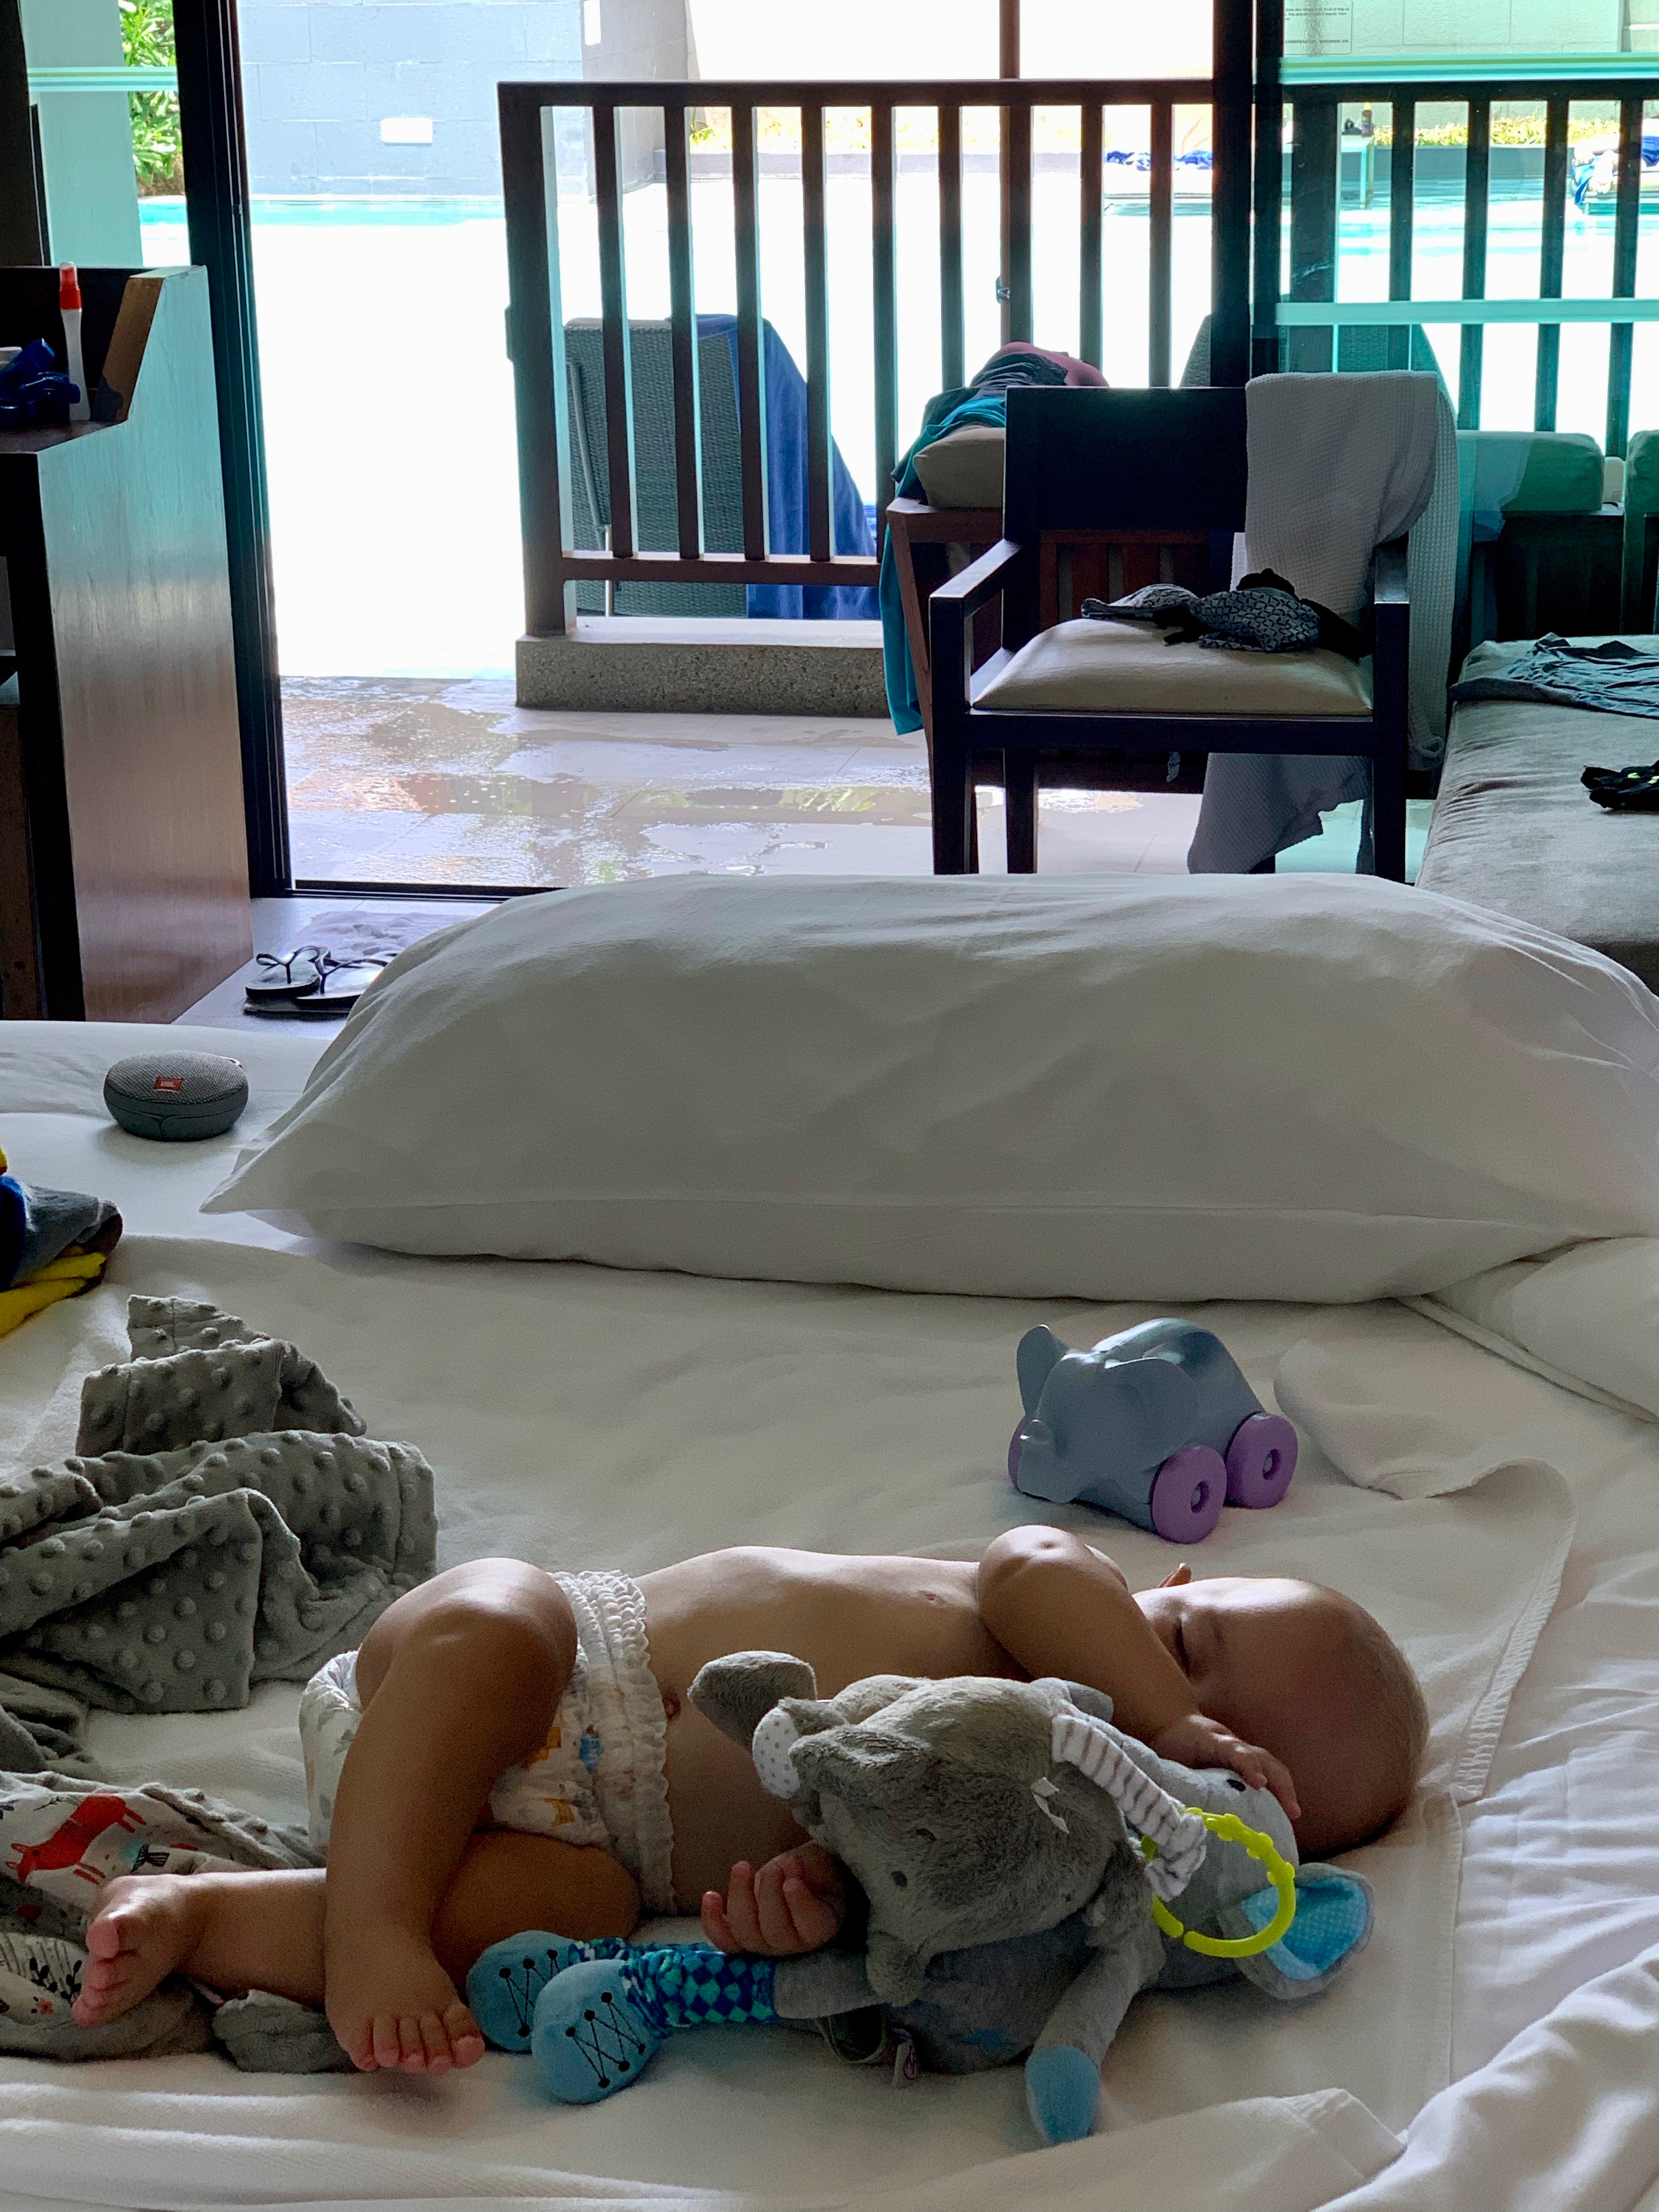 thewelltravelledfamily avista grande Phuket Patong